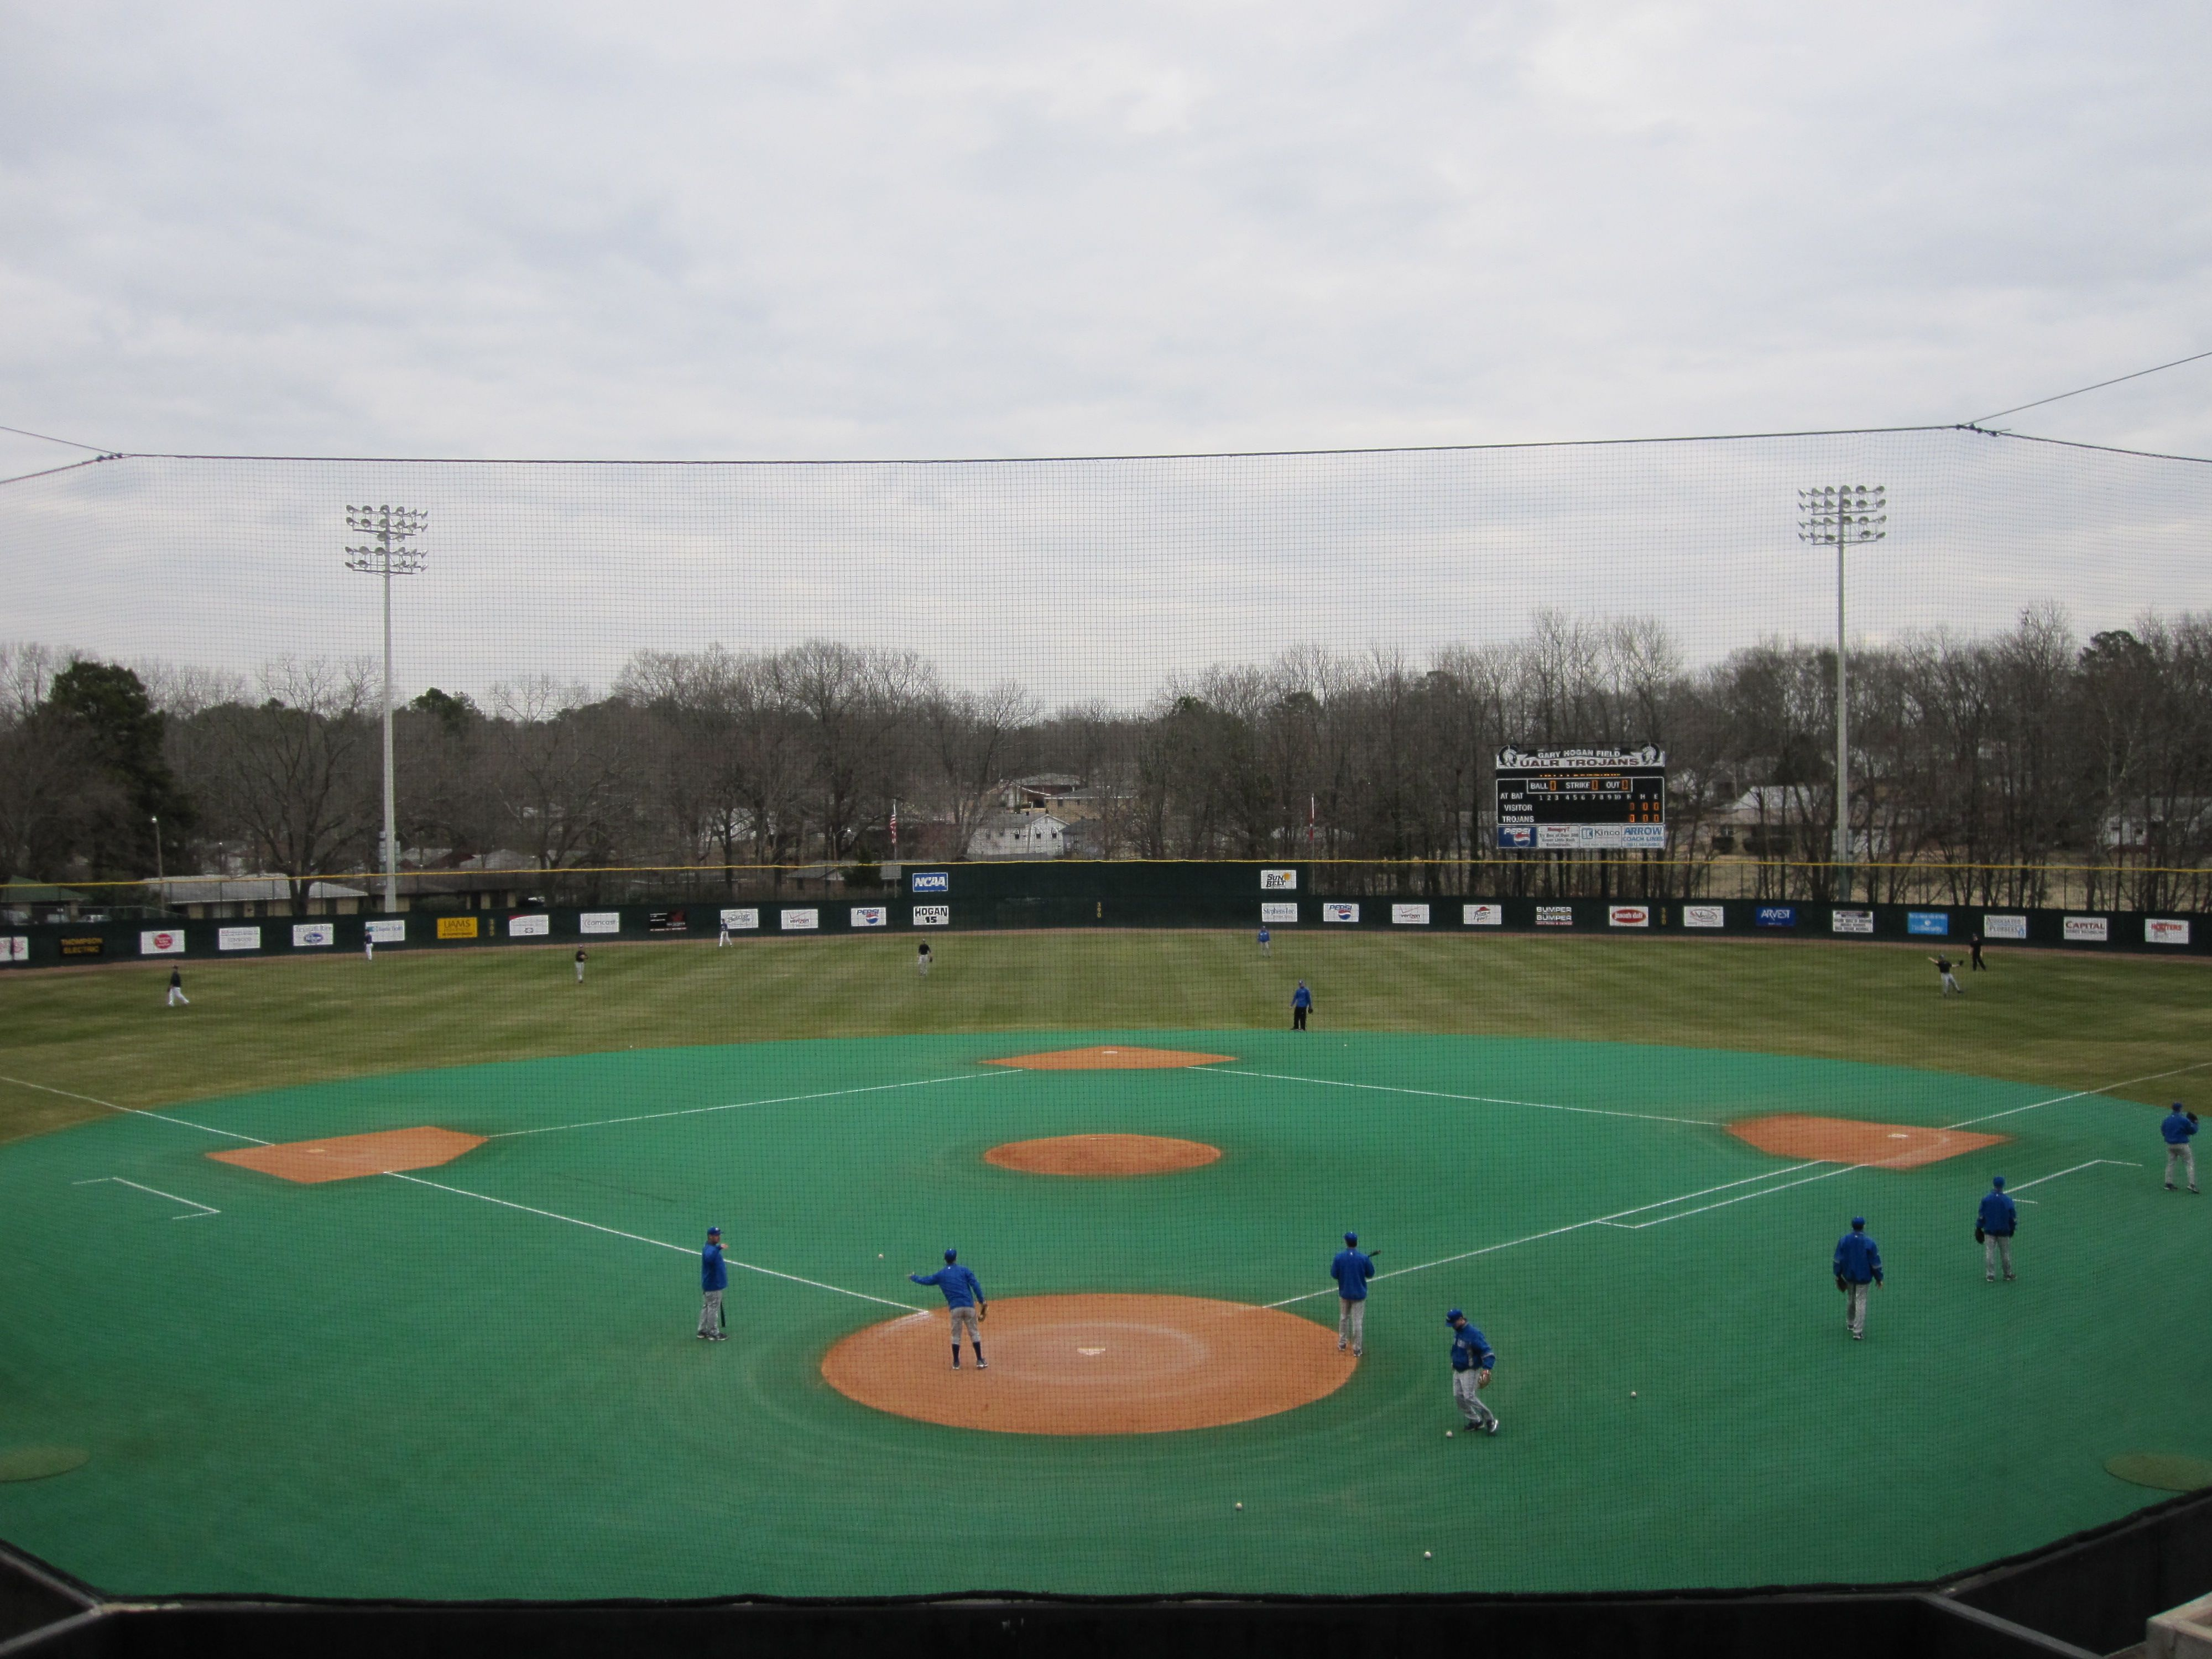 Gary Hogan Field Home Of The Ualr Trojans Field College Baseball Baseball Field